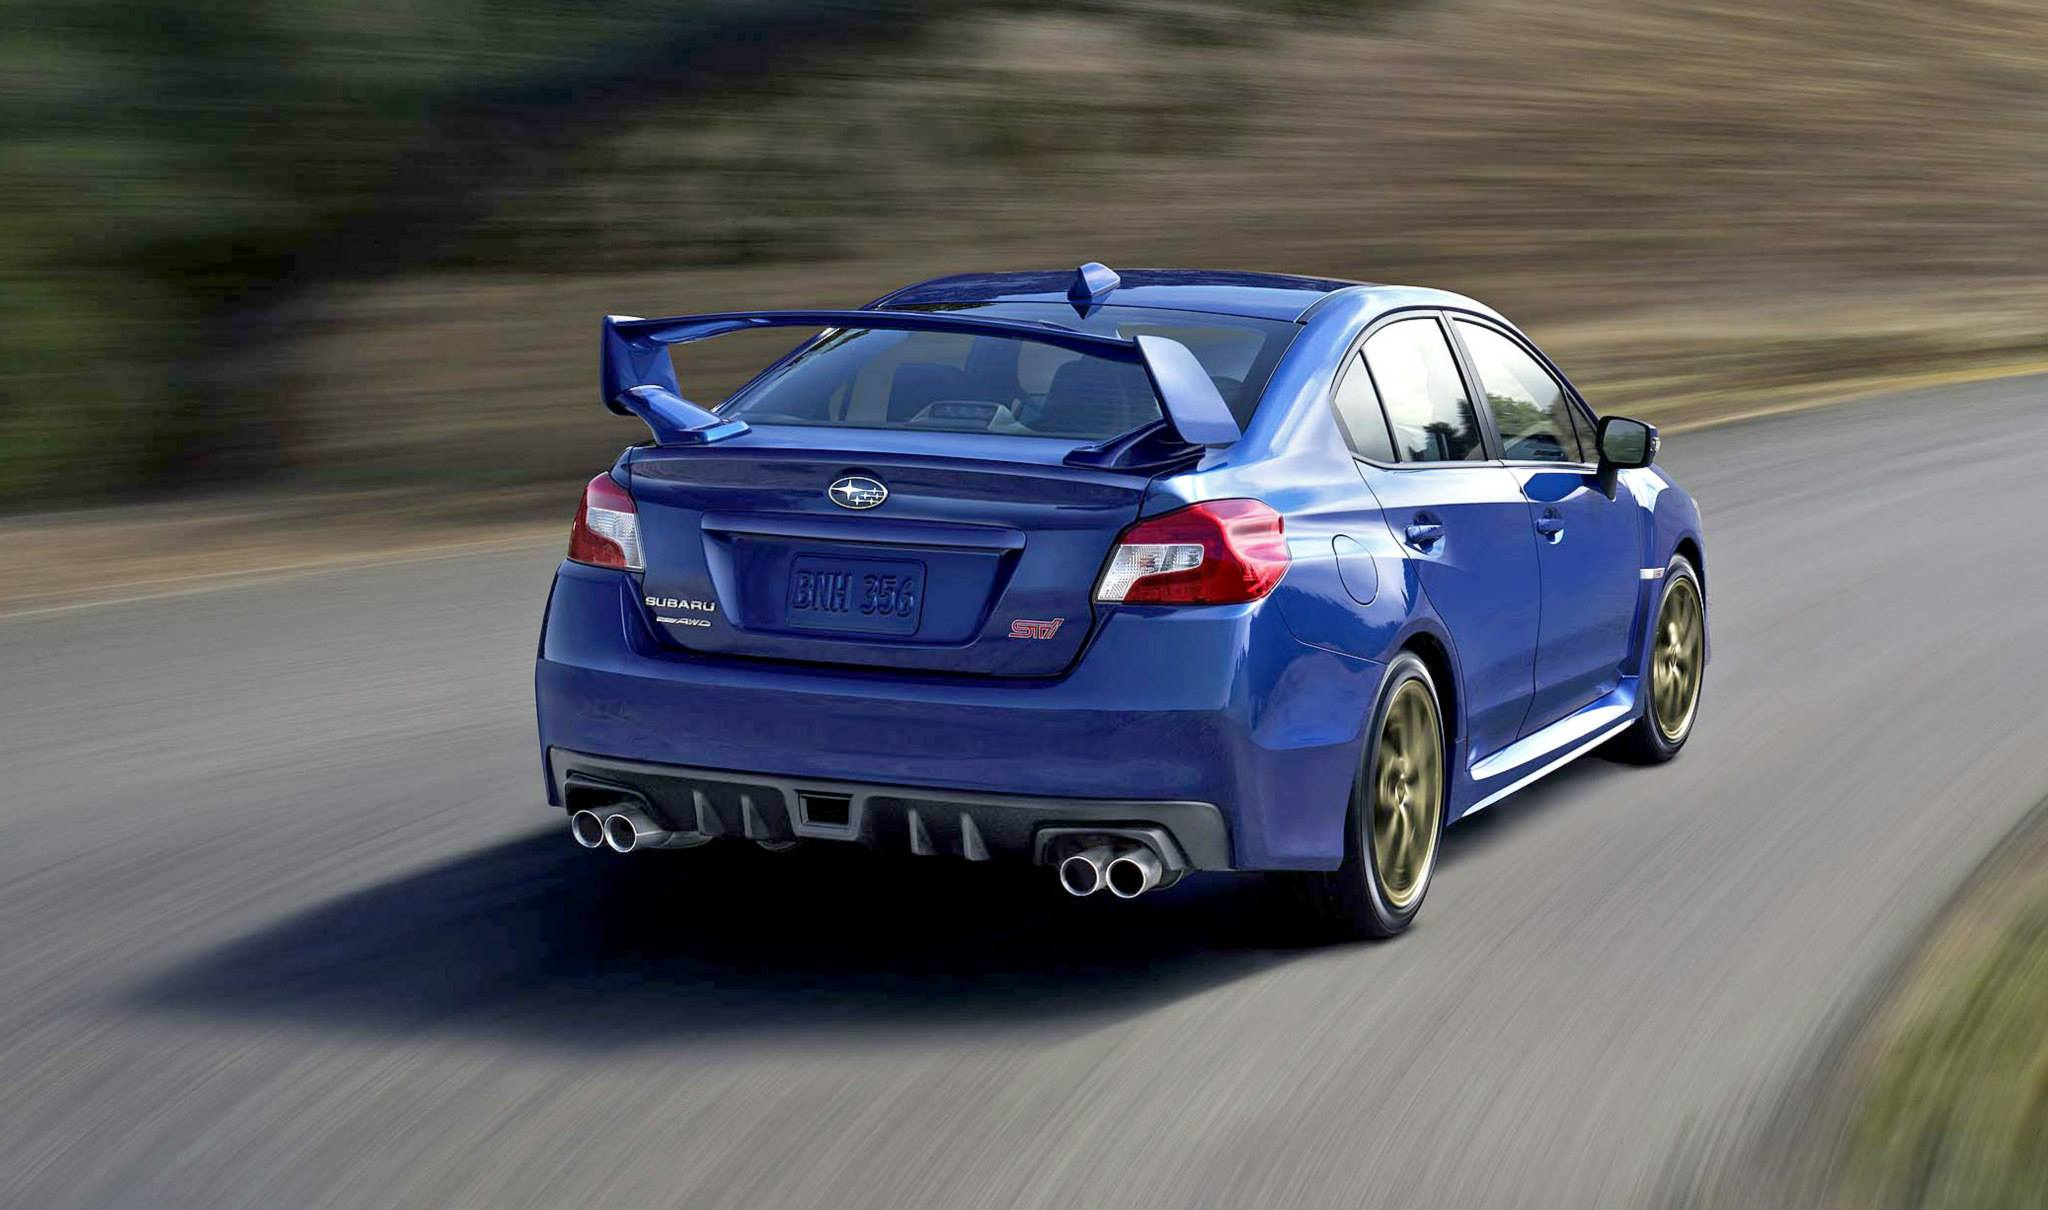 2015 Subaru WRX STi Official Images Surface